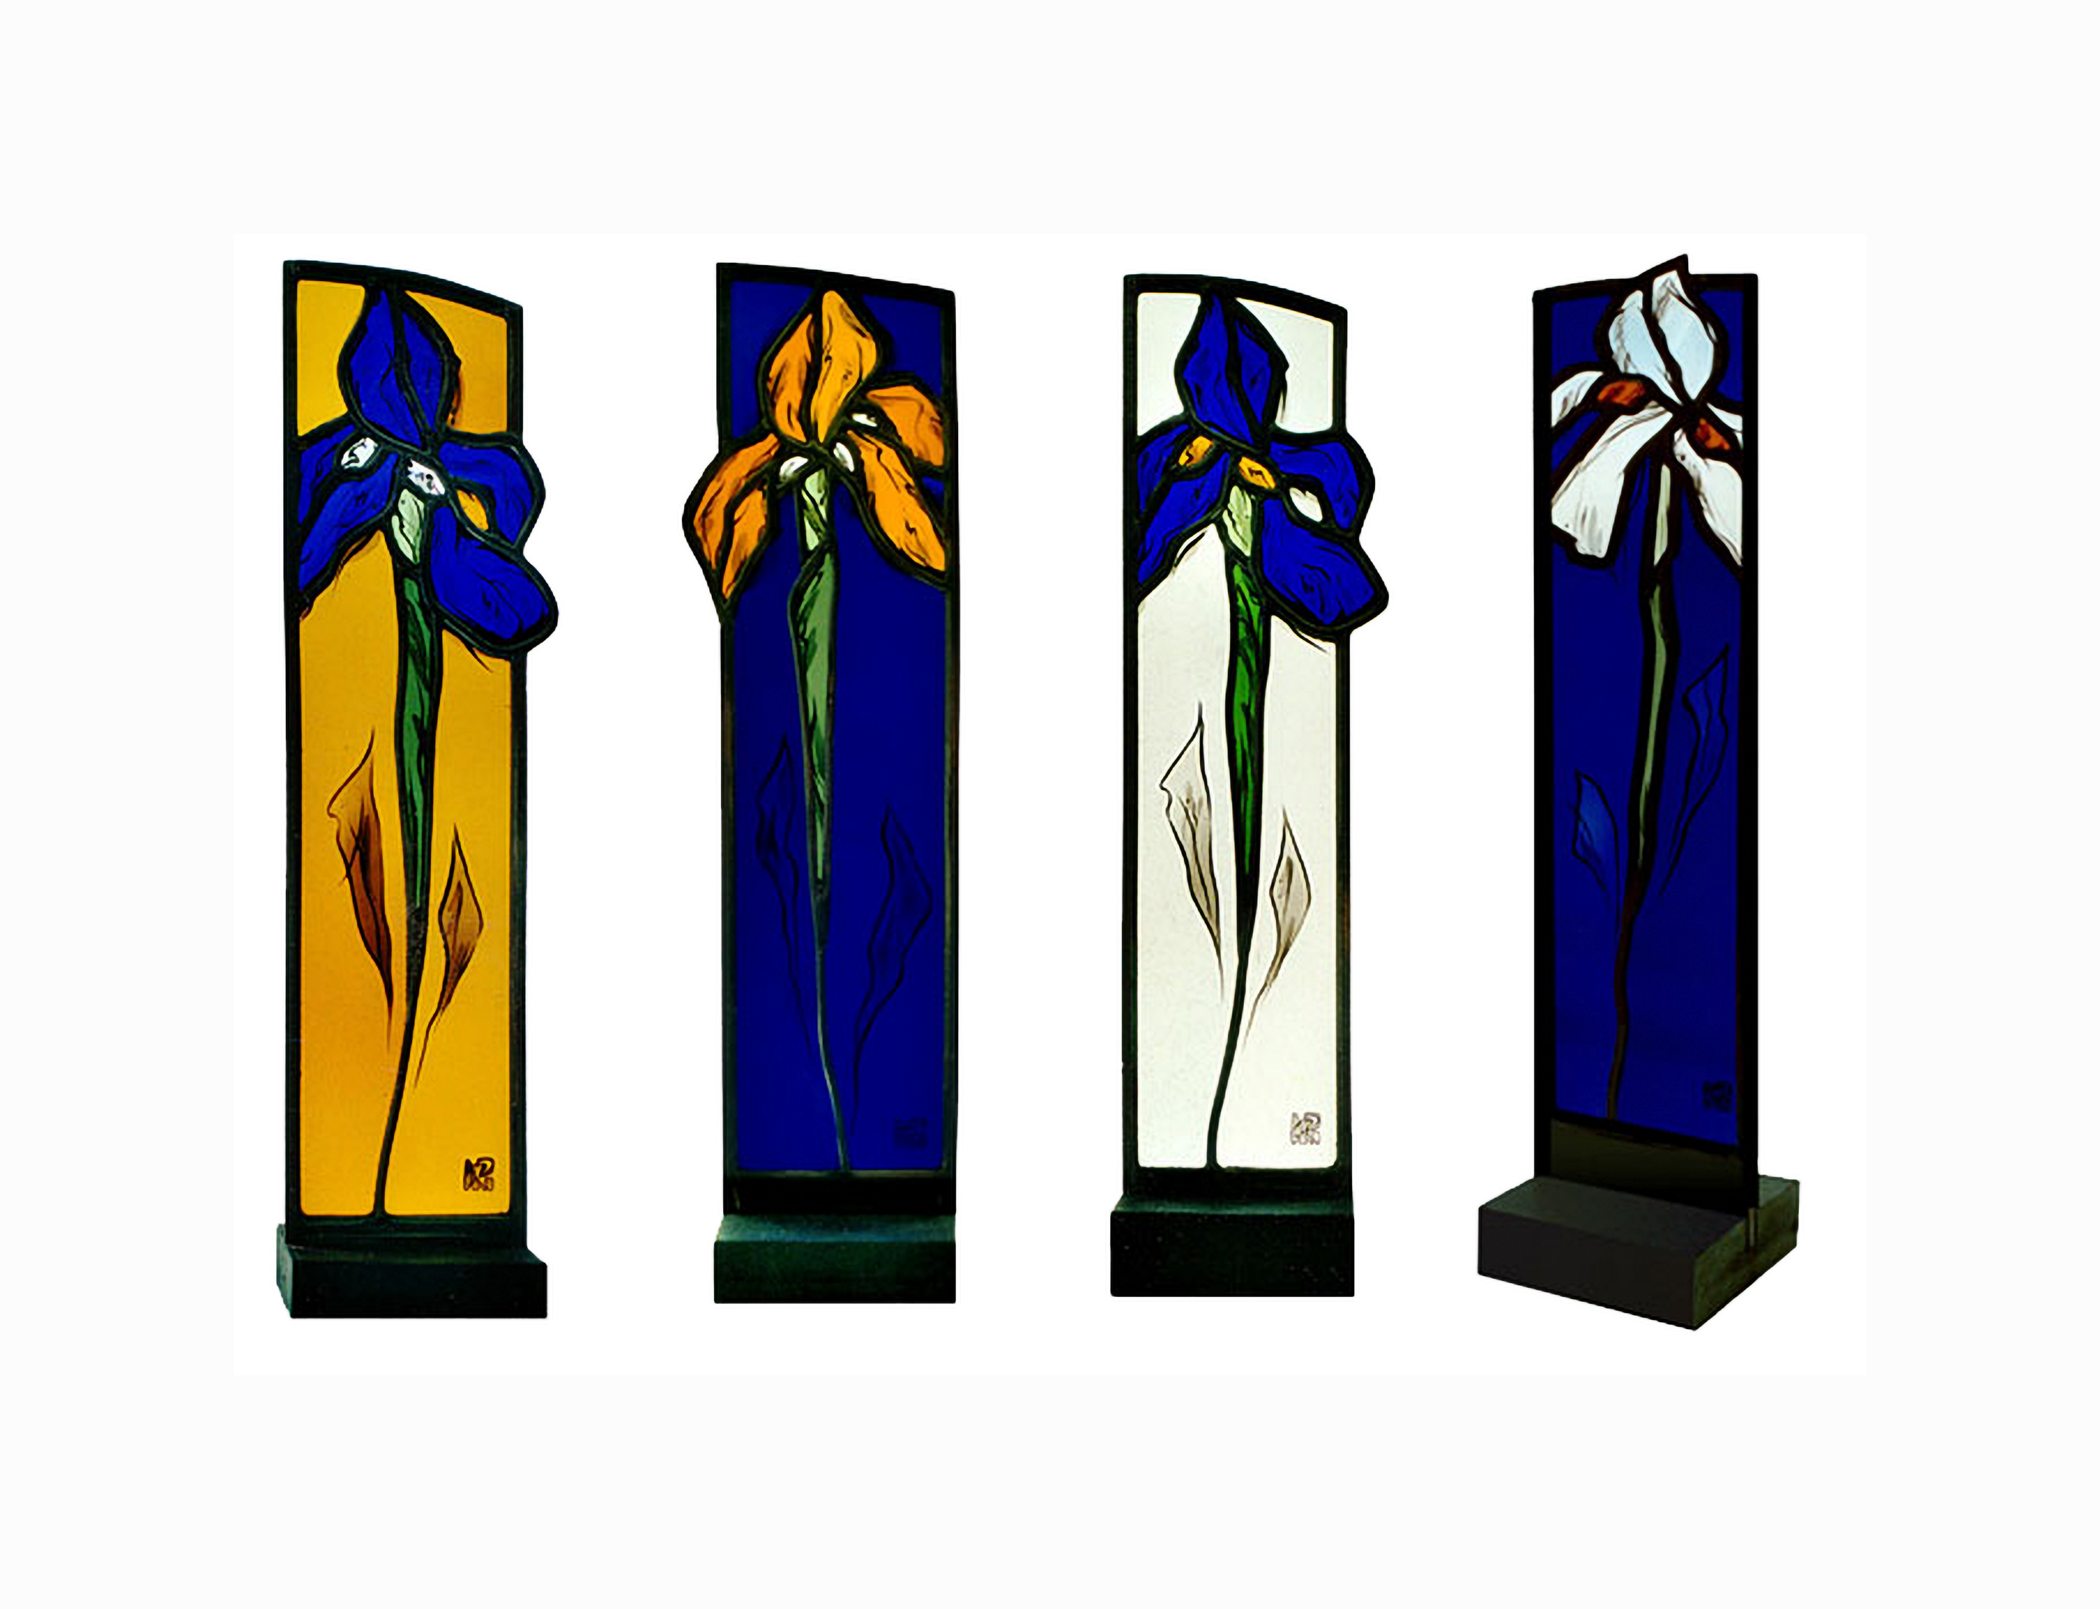 Glasstelen auf Schiefersockel - Iris – Atelier für Glasmalerei - PeterGlasmalerei Peter Kuster